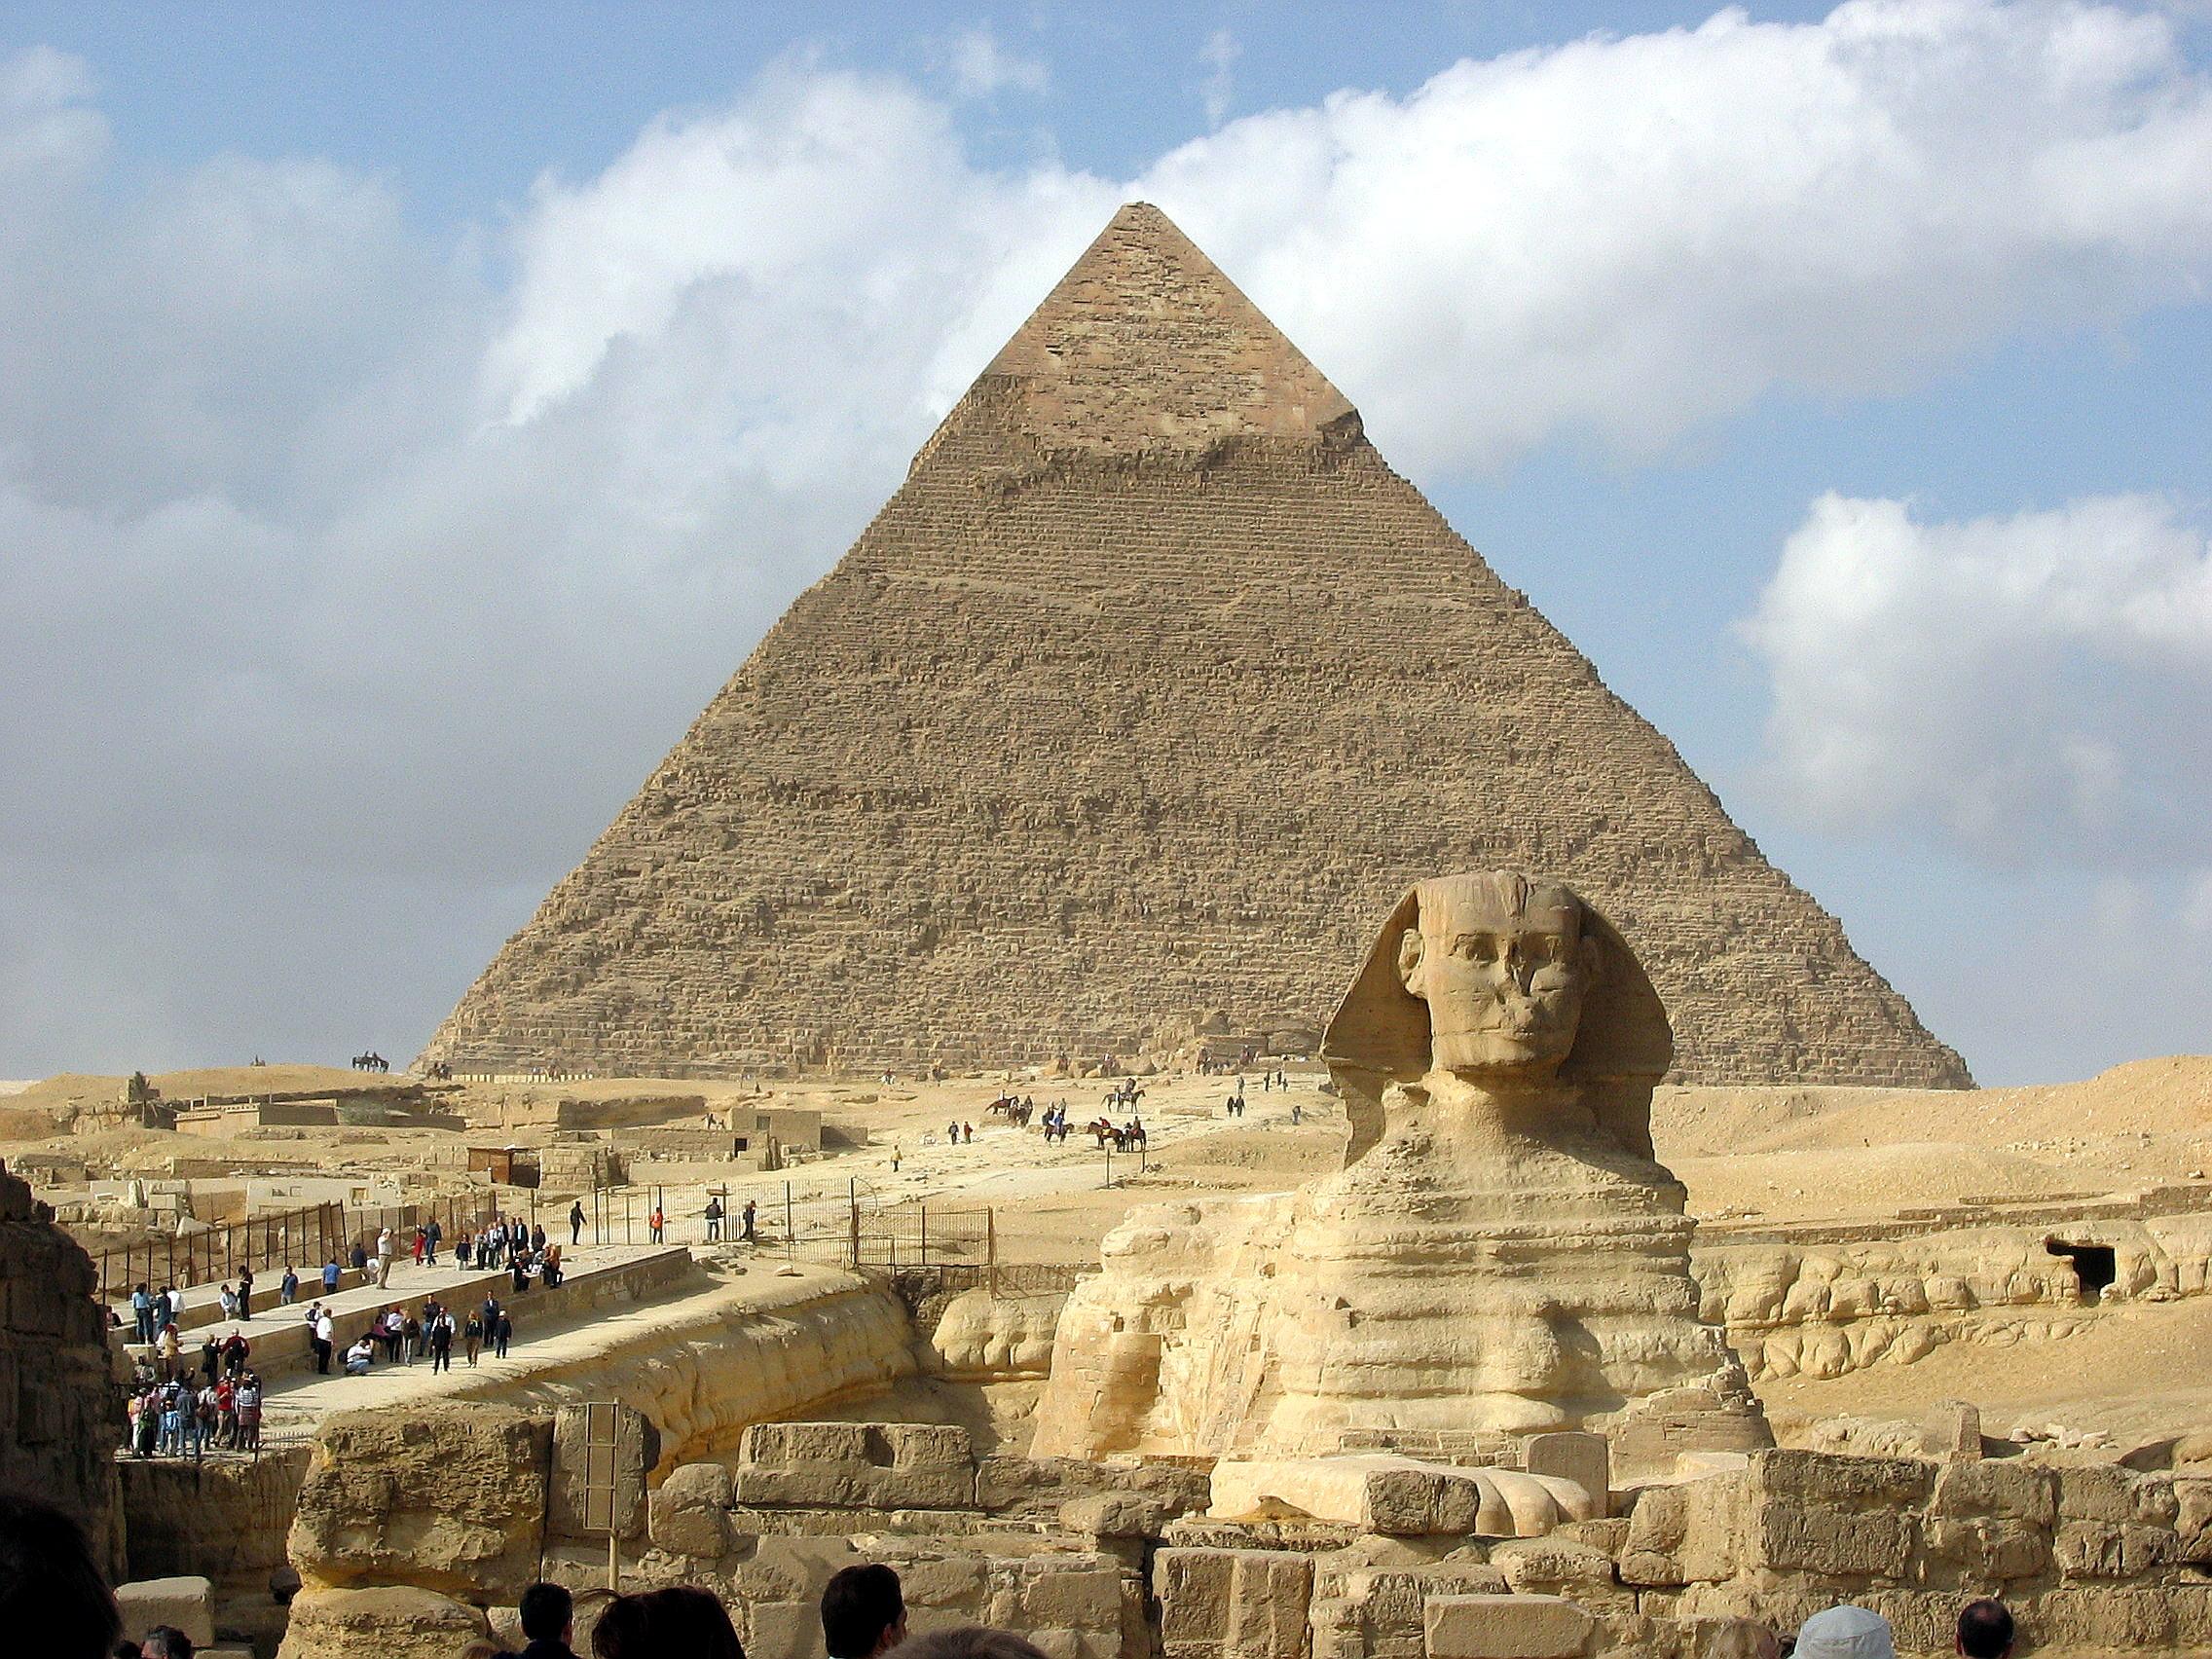 Сфинкс на фоне пирамиды хефрена